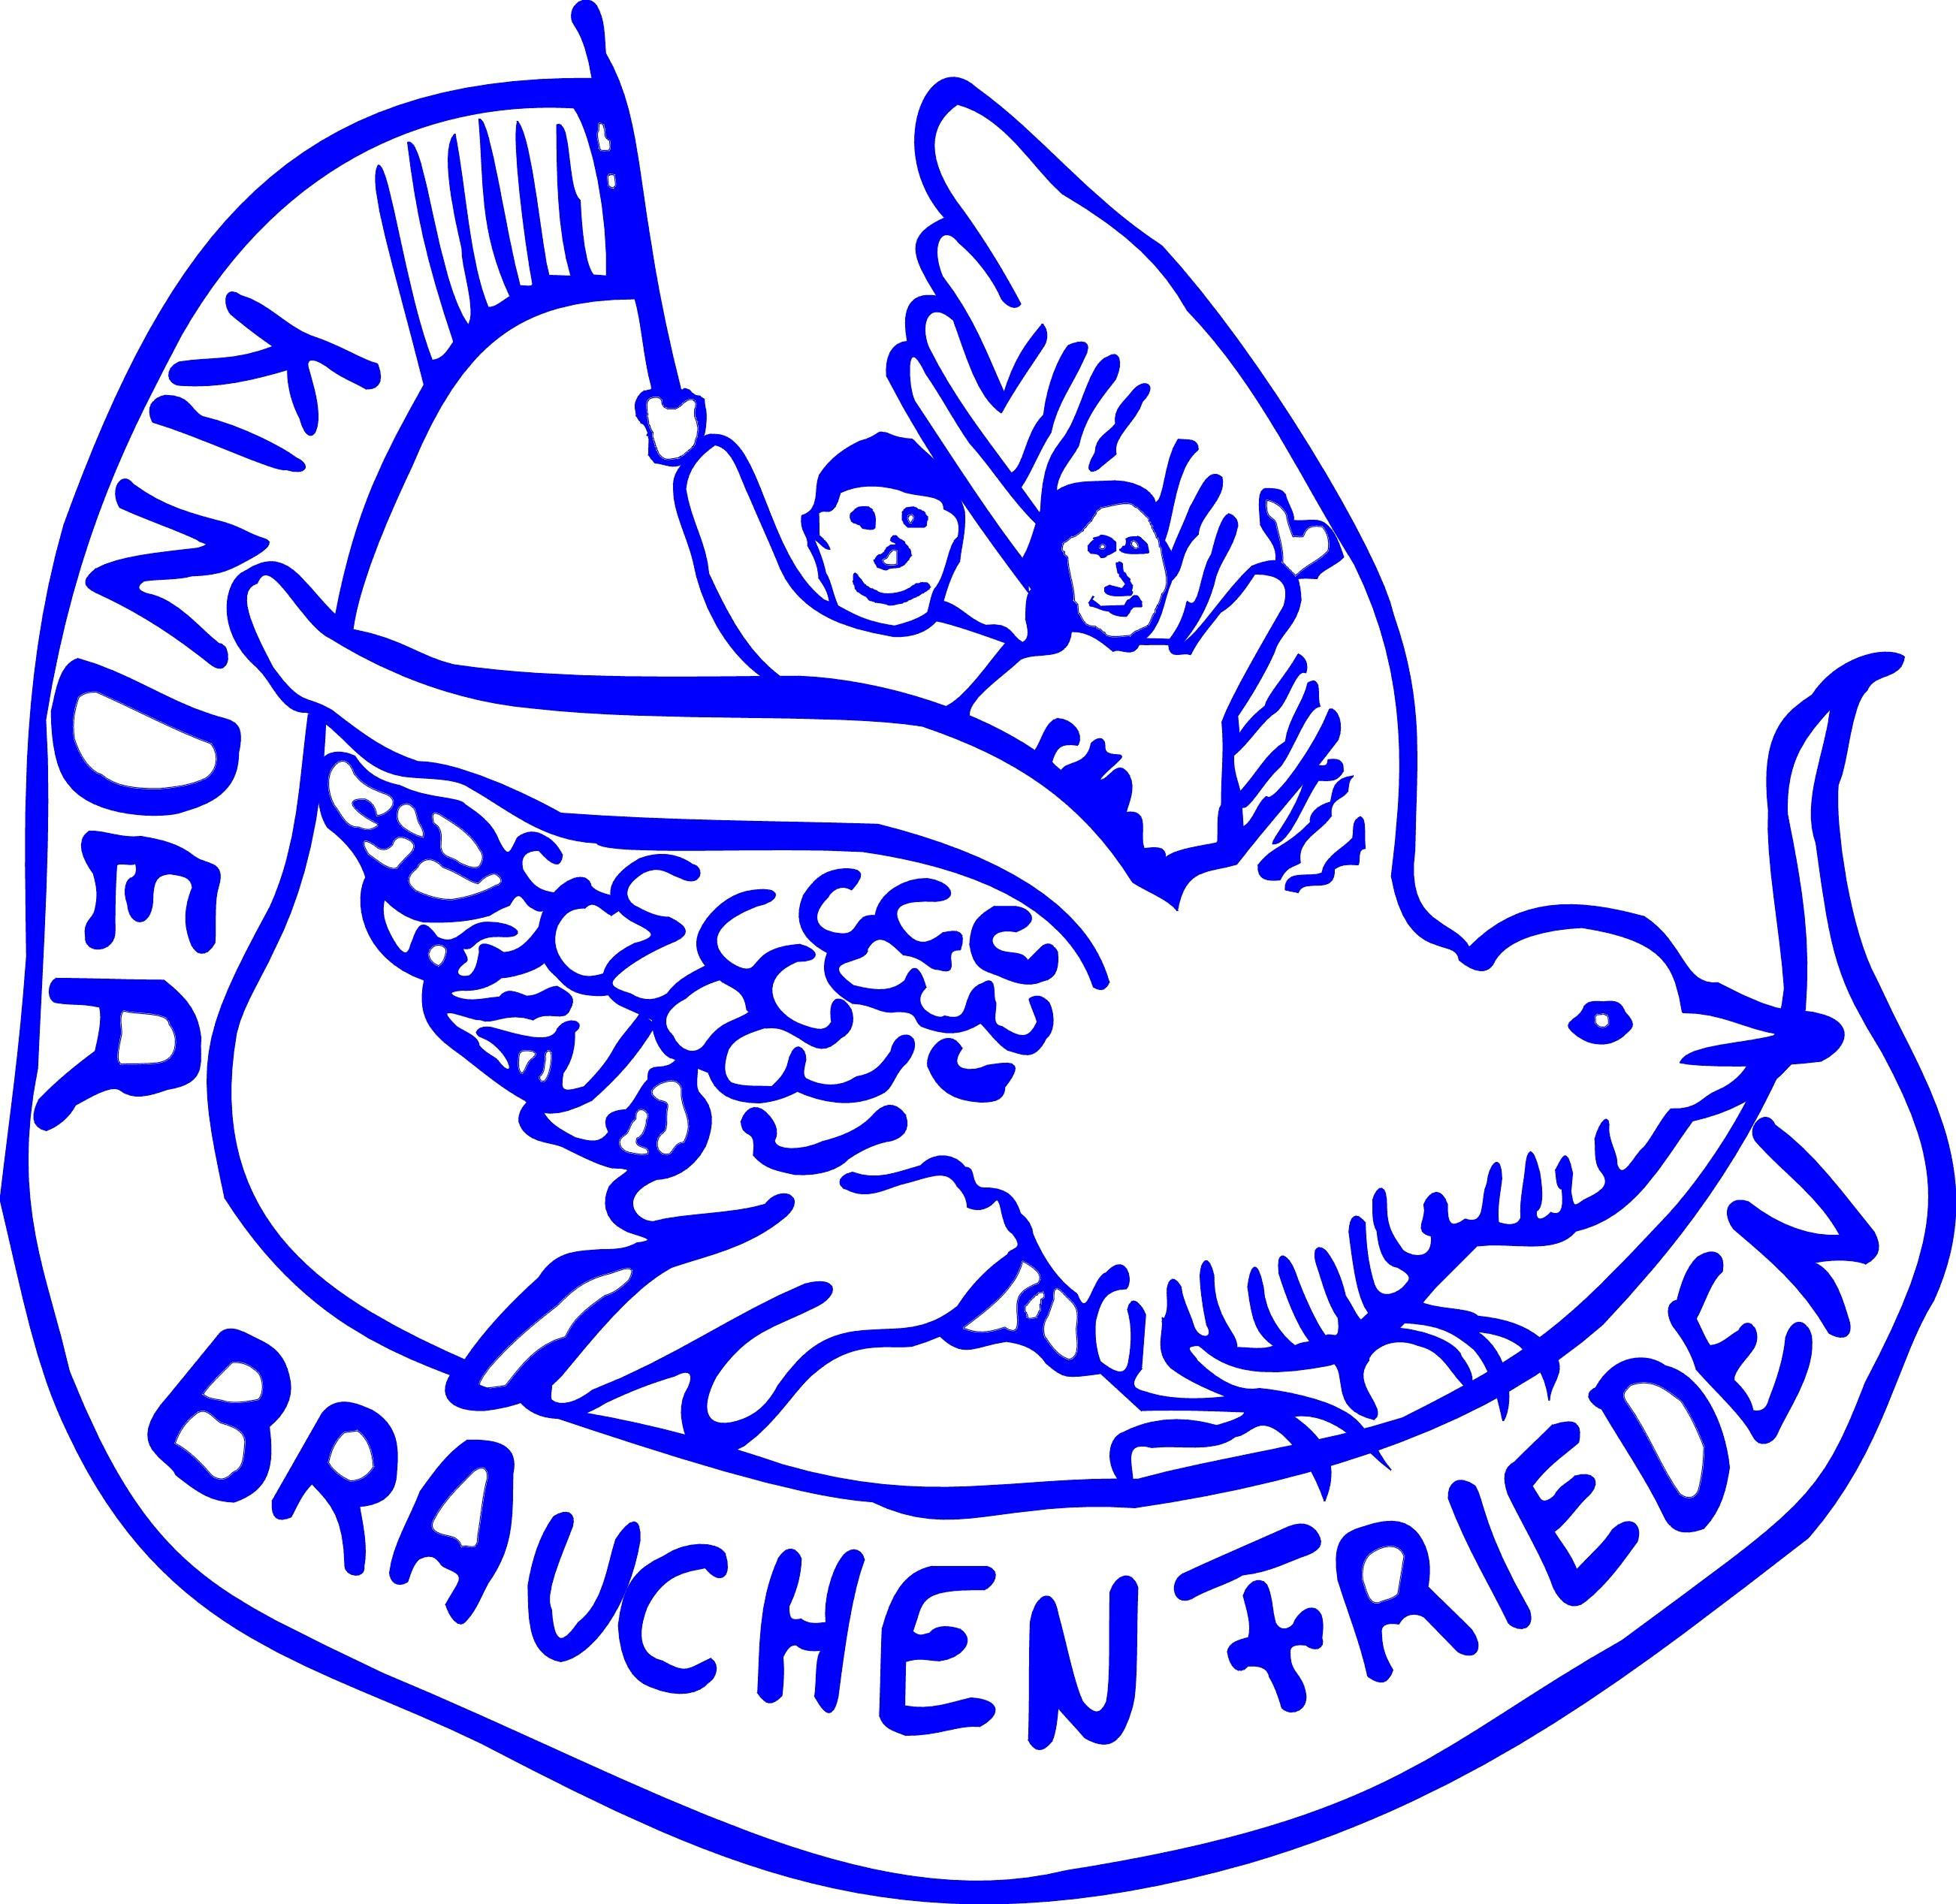 http://www.kinder-brauchen-frieden.de/